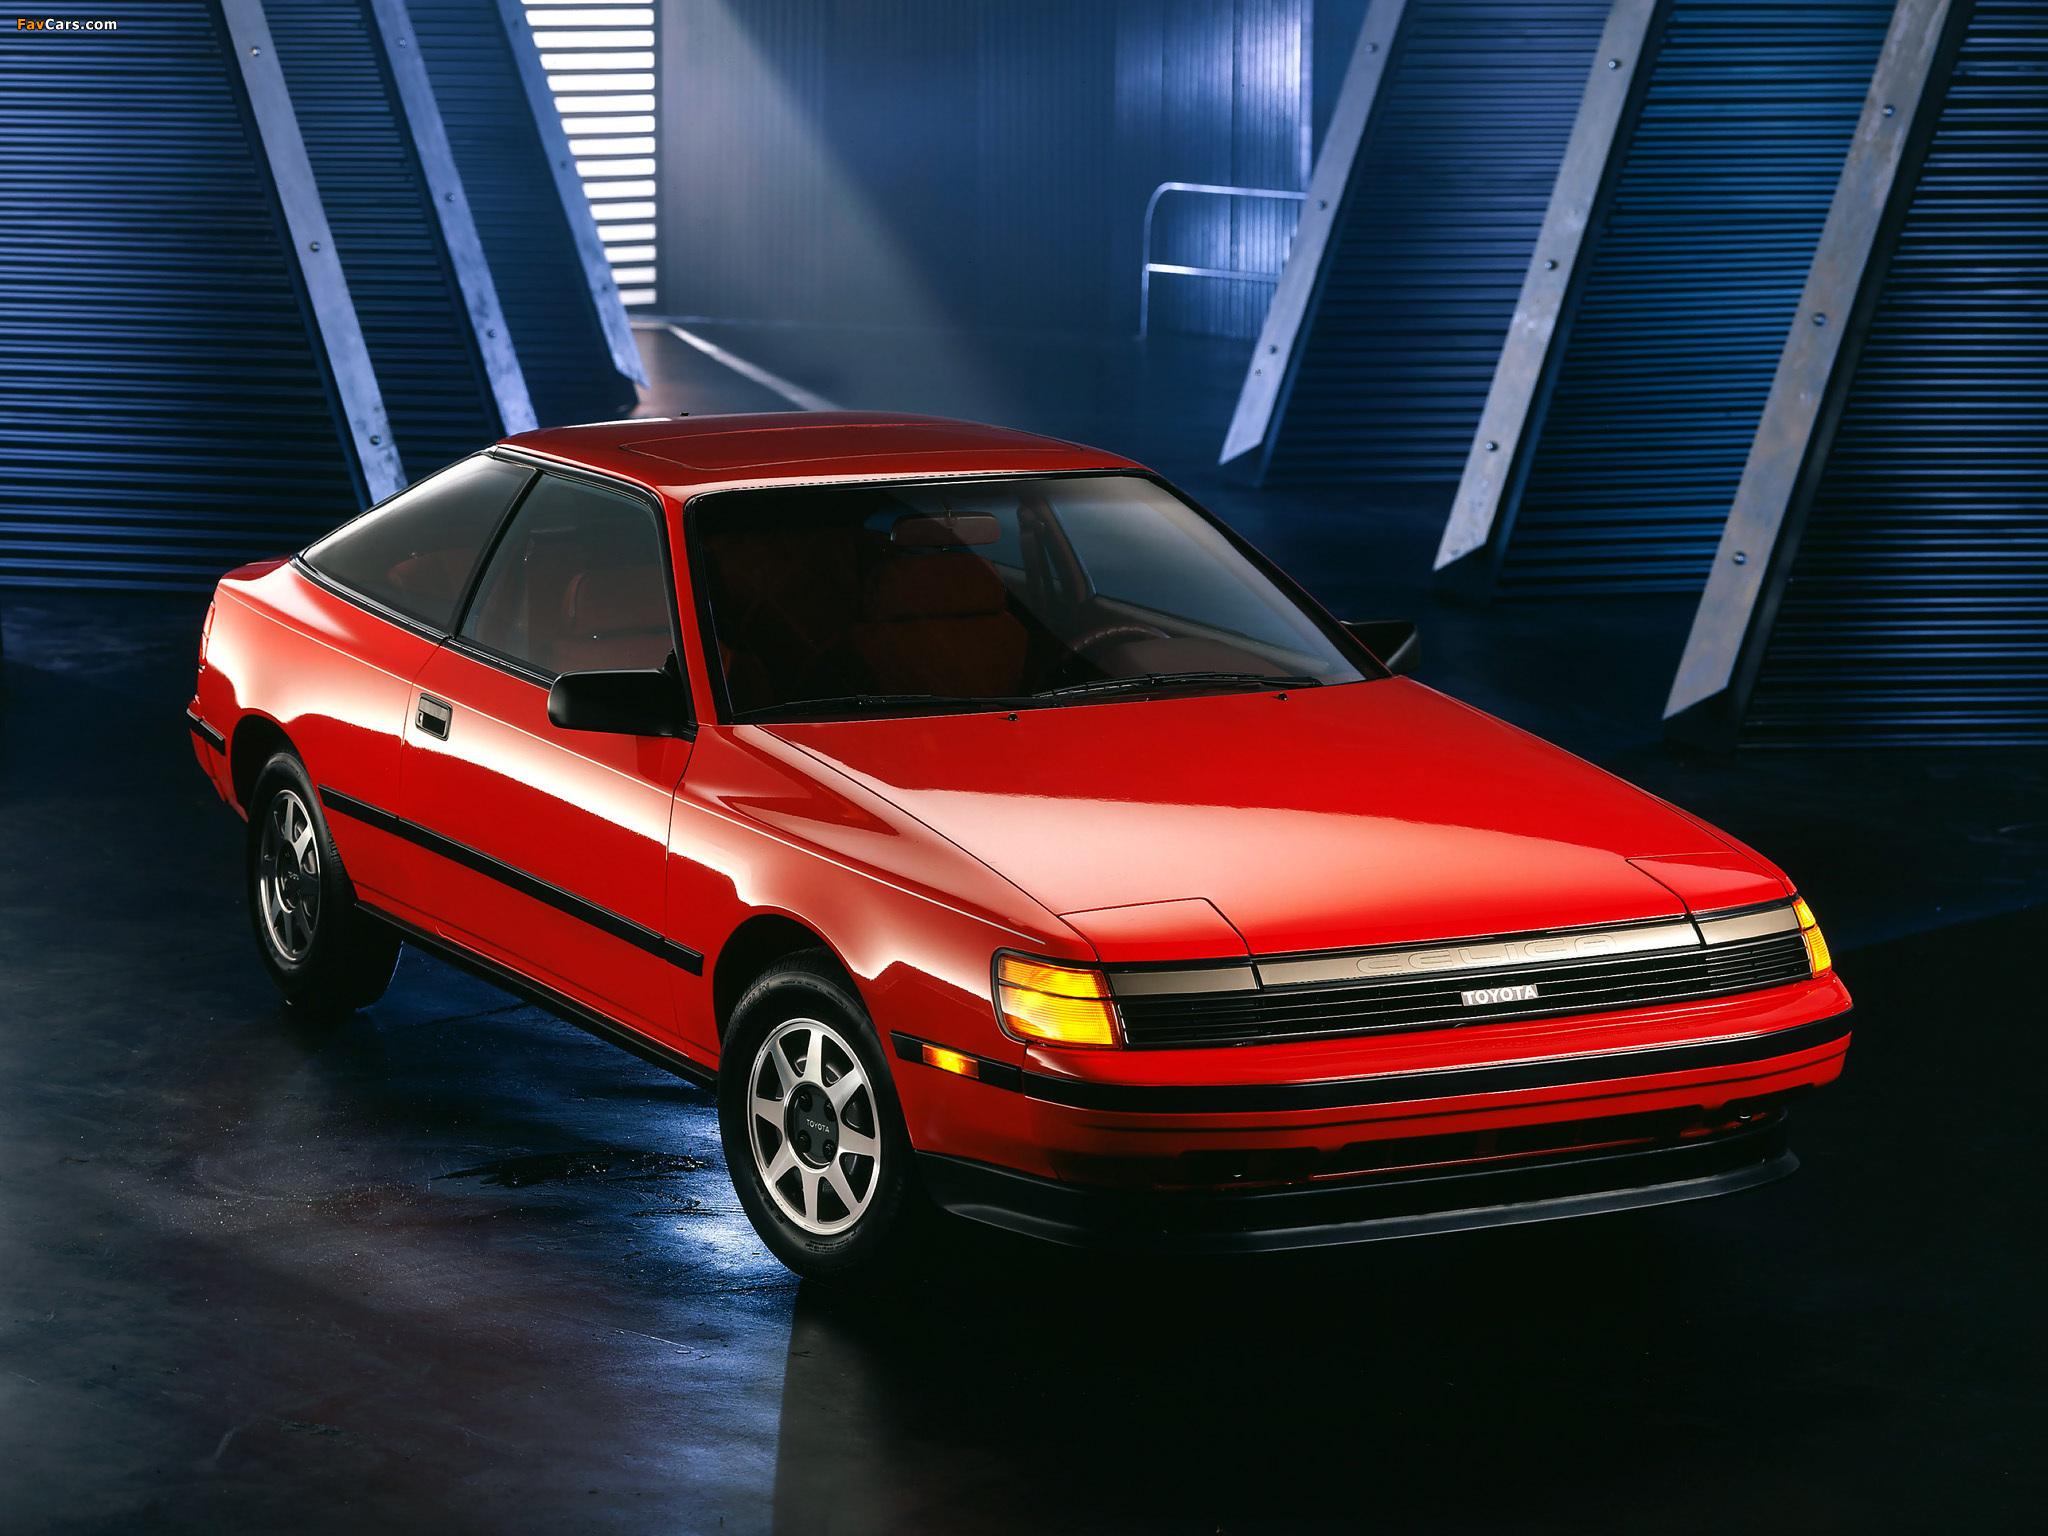 Toyota Celica 20 Gt Liftback Us Spec St162 198889 Wallpapers 1983 Gts